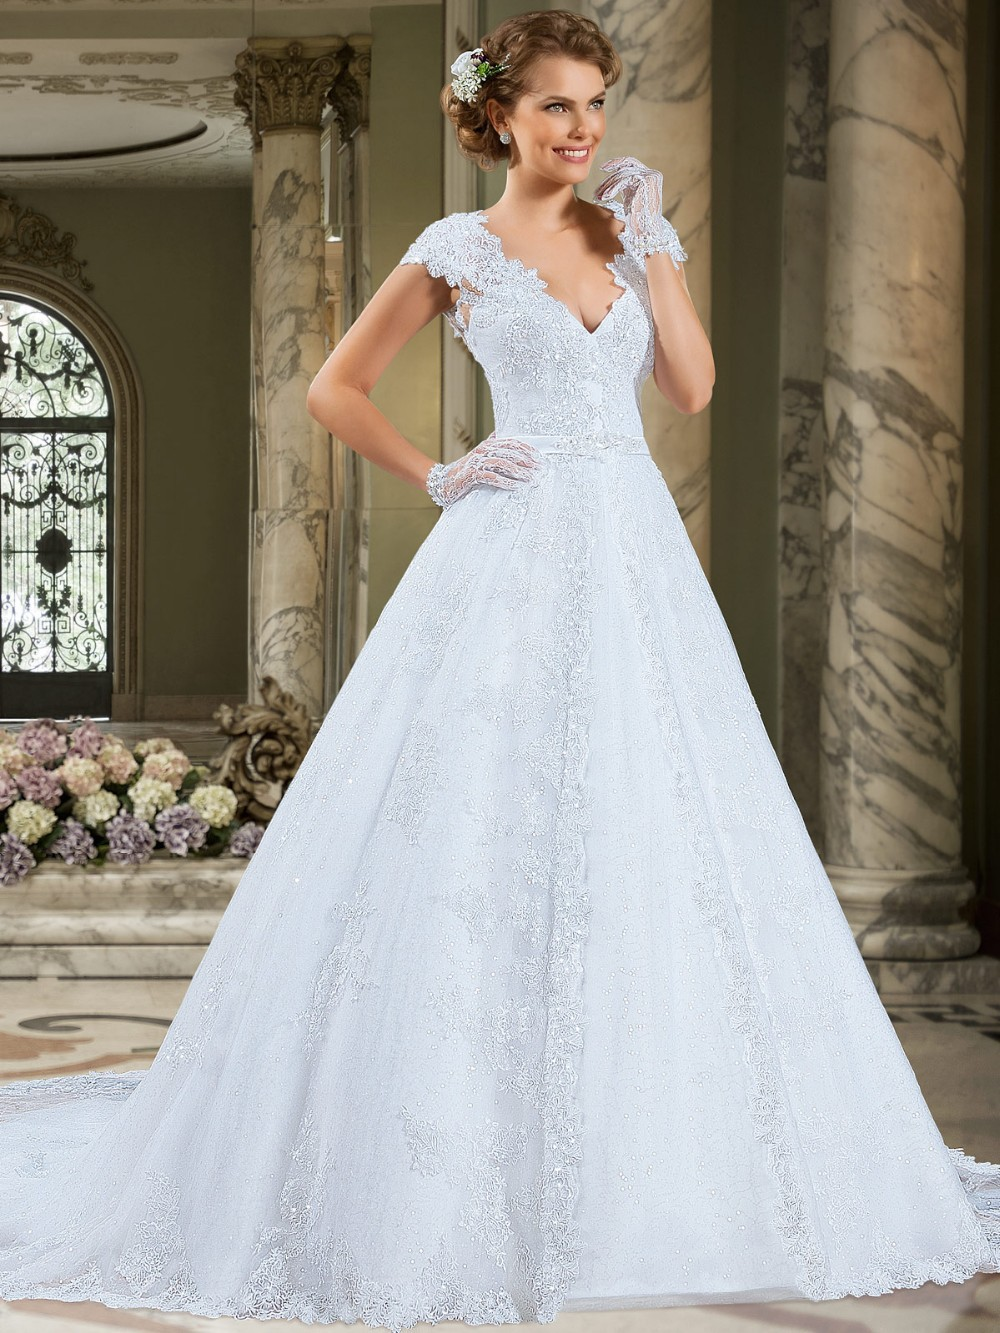 Stunning A-Line V-Neck Cap Sleeve Vintage Lace 2018 Hot Sweetangel Robe De Mariage Vestido De Noiva Mother Of The Bride Dresses